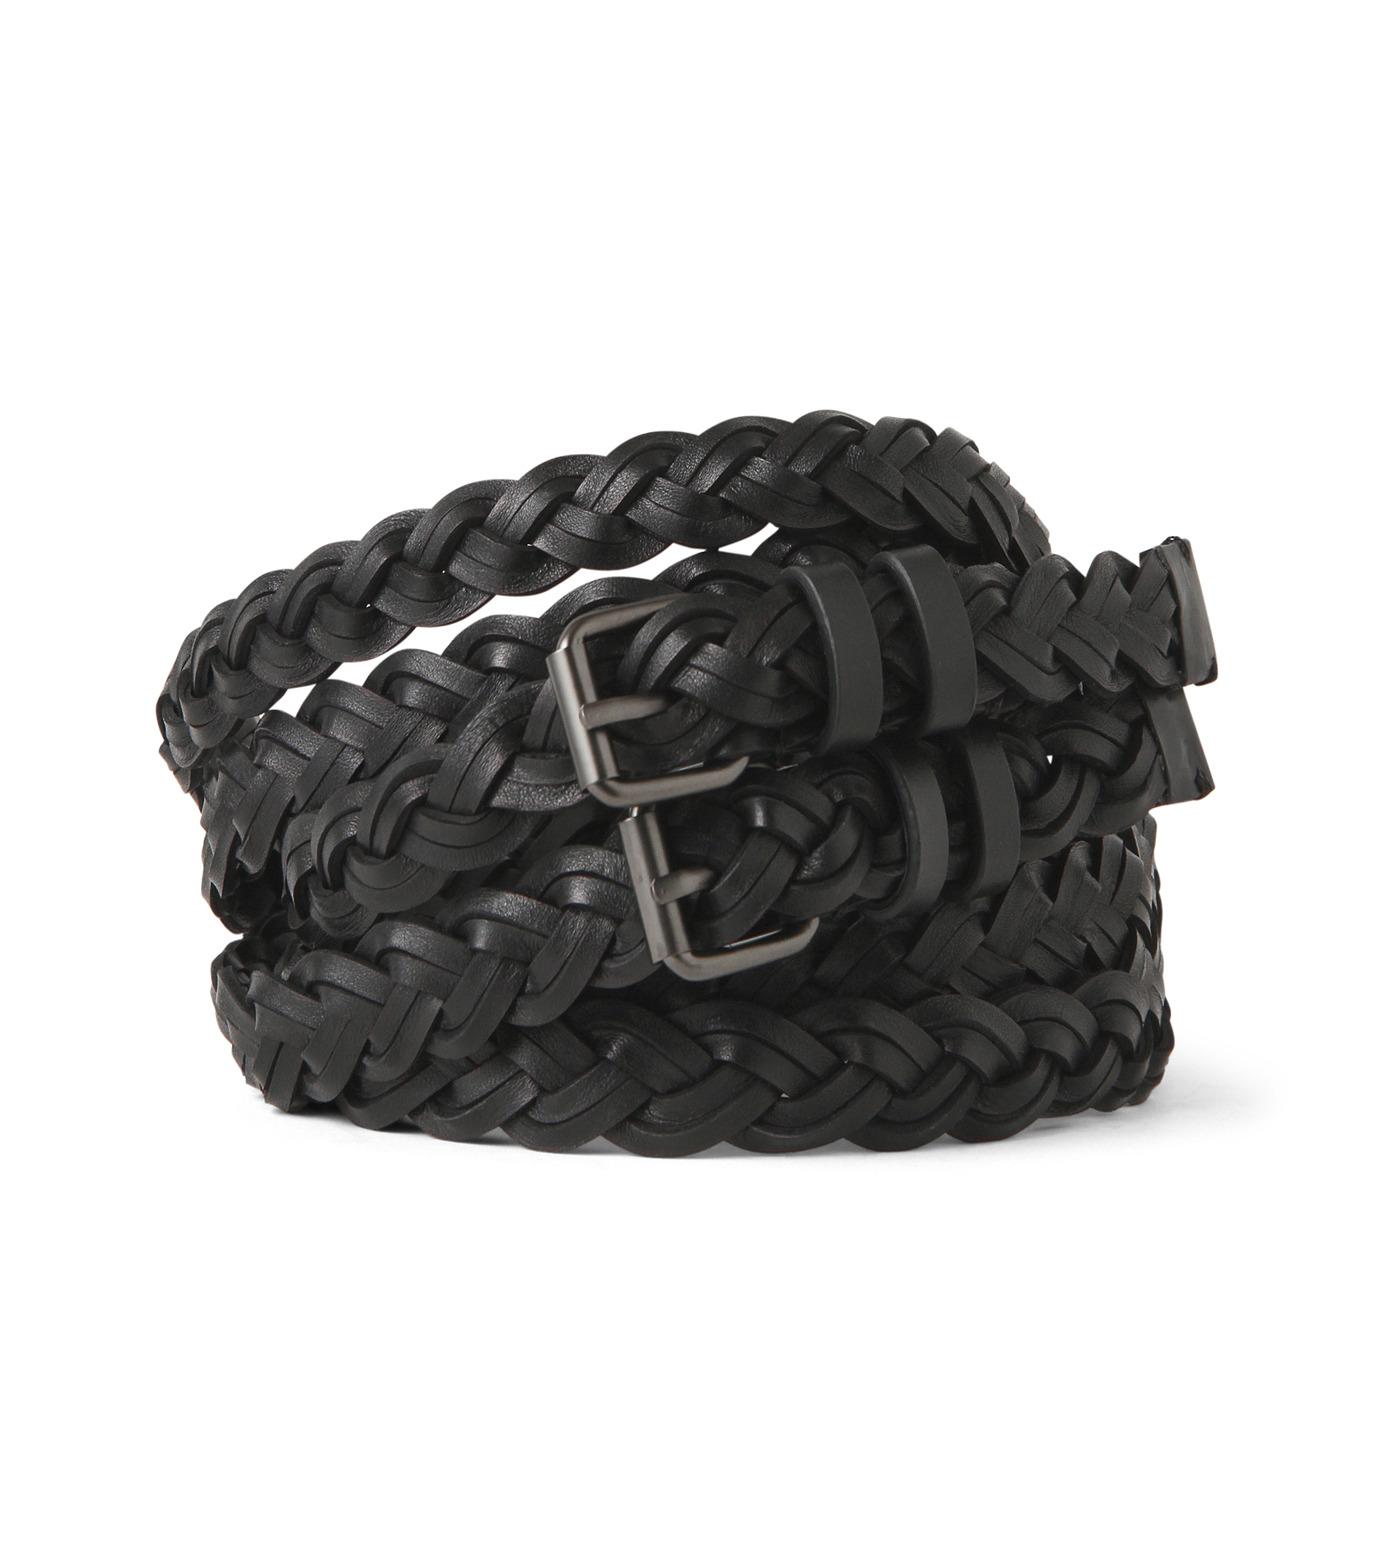 Haider Ackermann(ハイダー アッカーマン)のMesh Belt-BLACK(ベルト/belt)-439-89981001-13 拡大詳細画像1